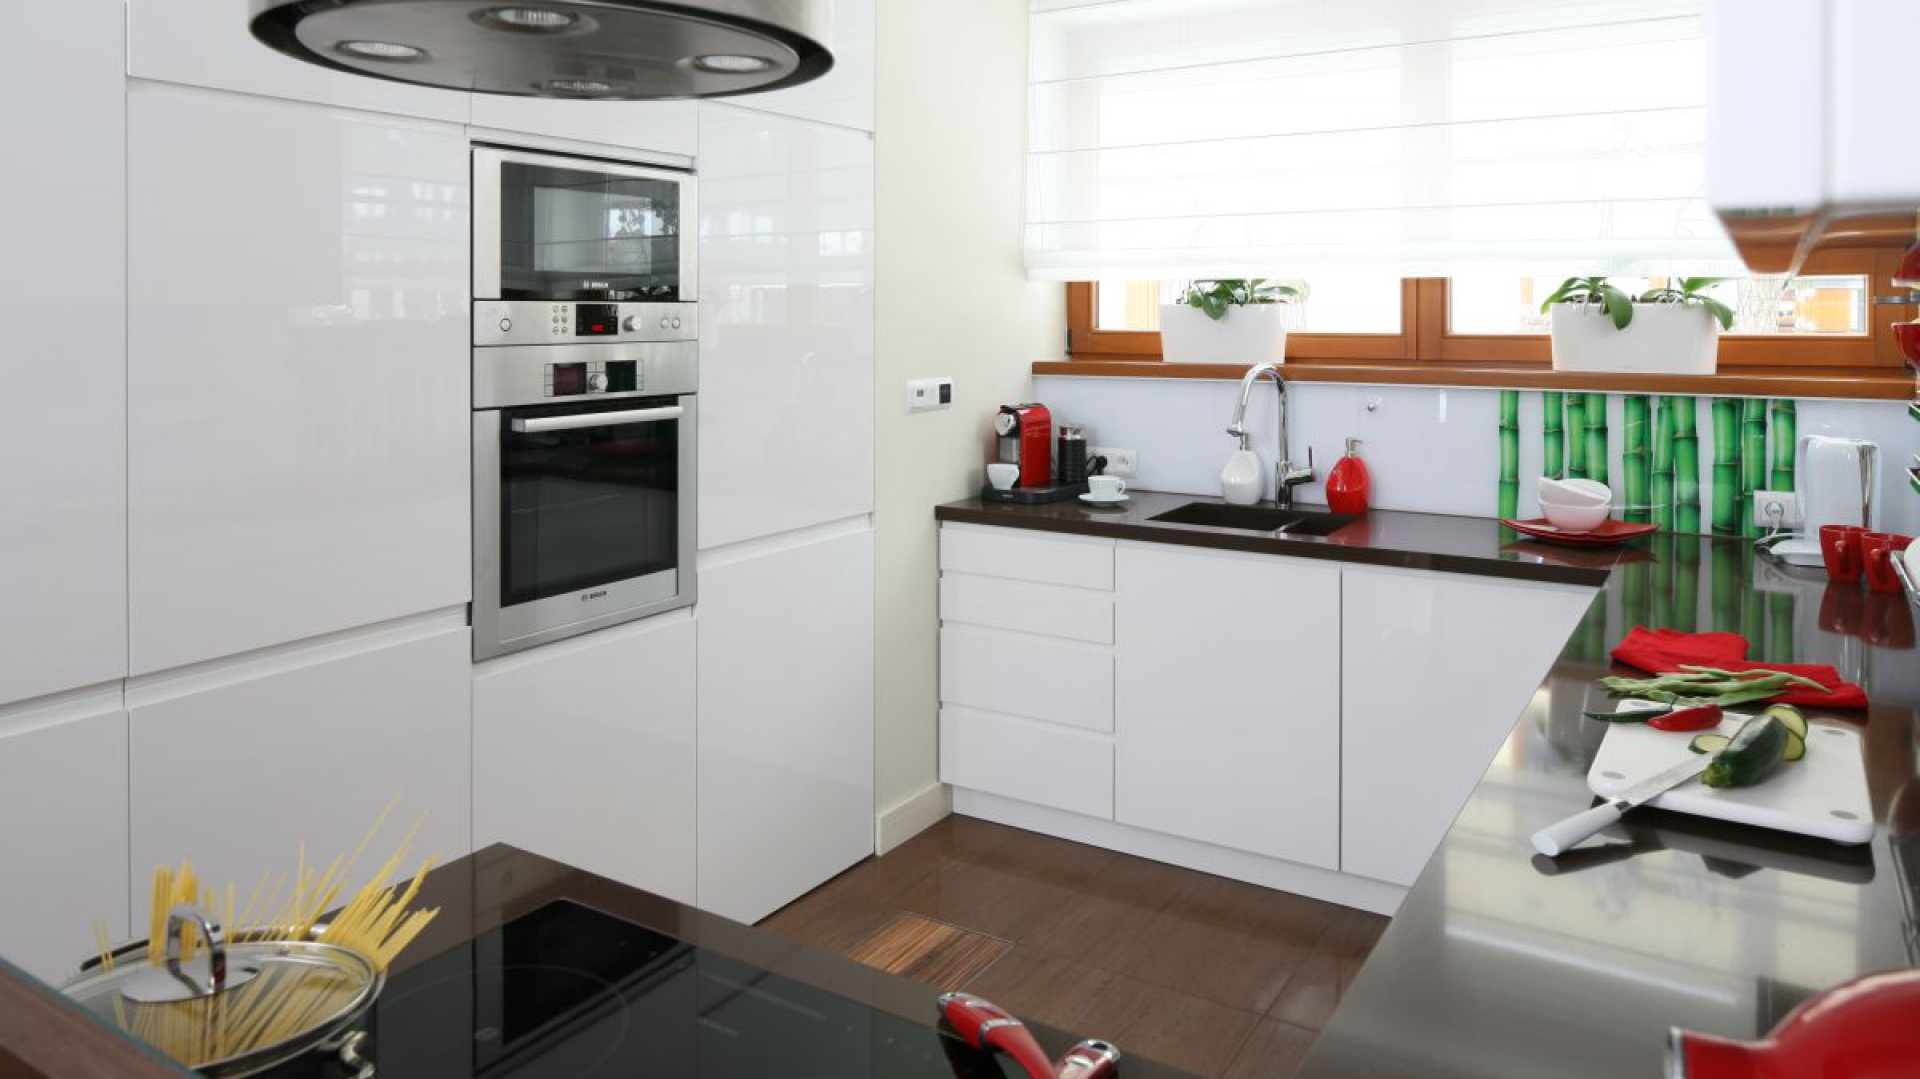 bia�e meble kuchenne z kuchnia na wysoki po�ysk 20